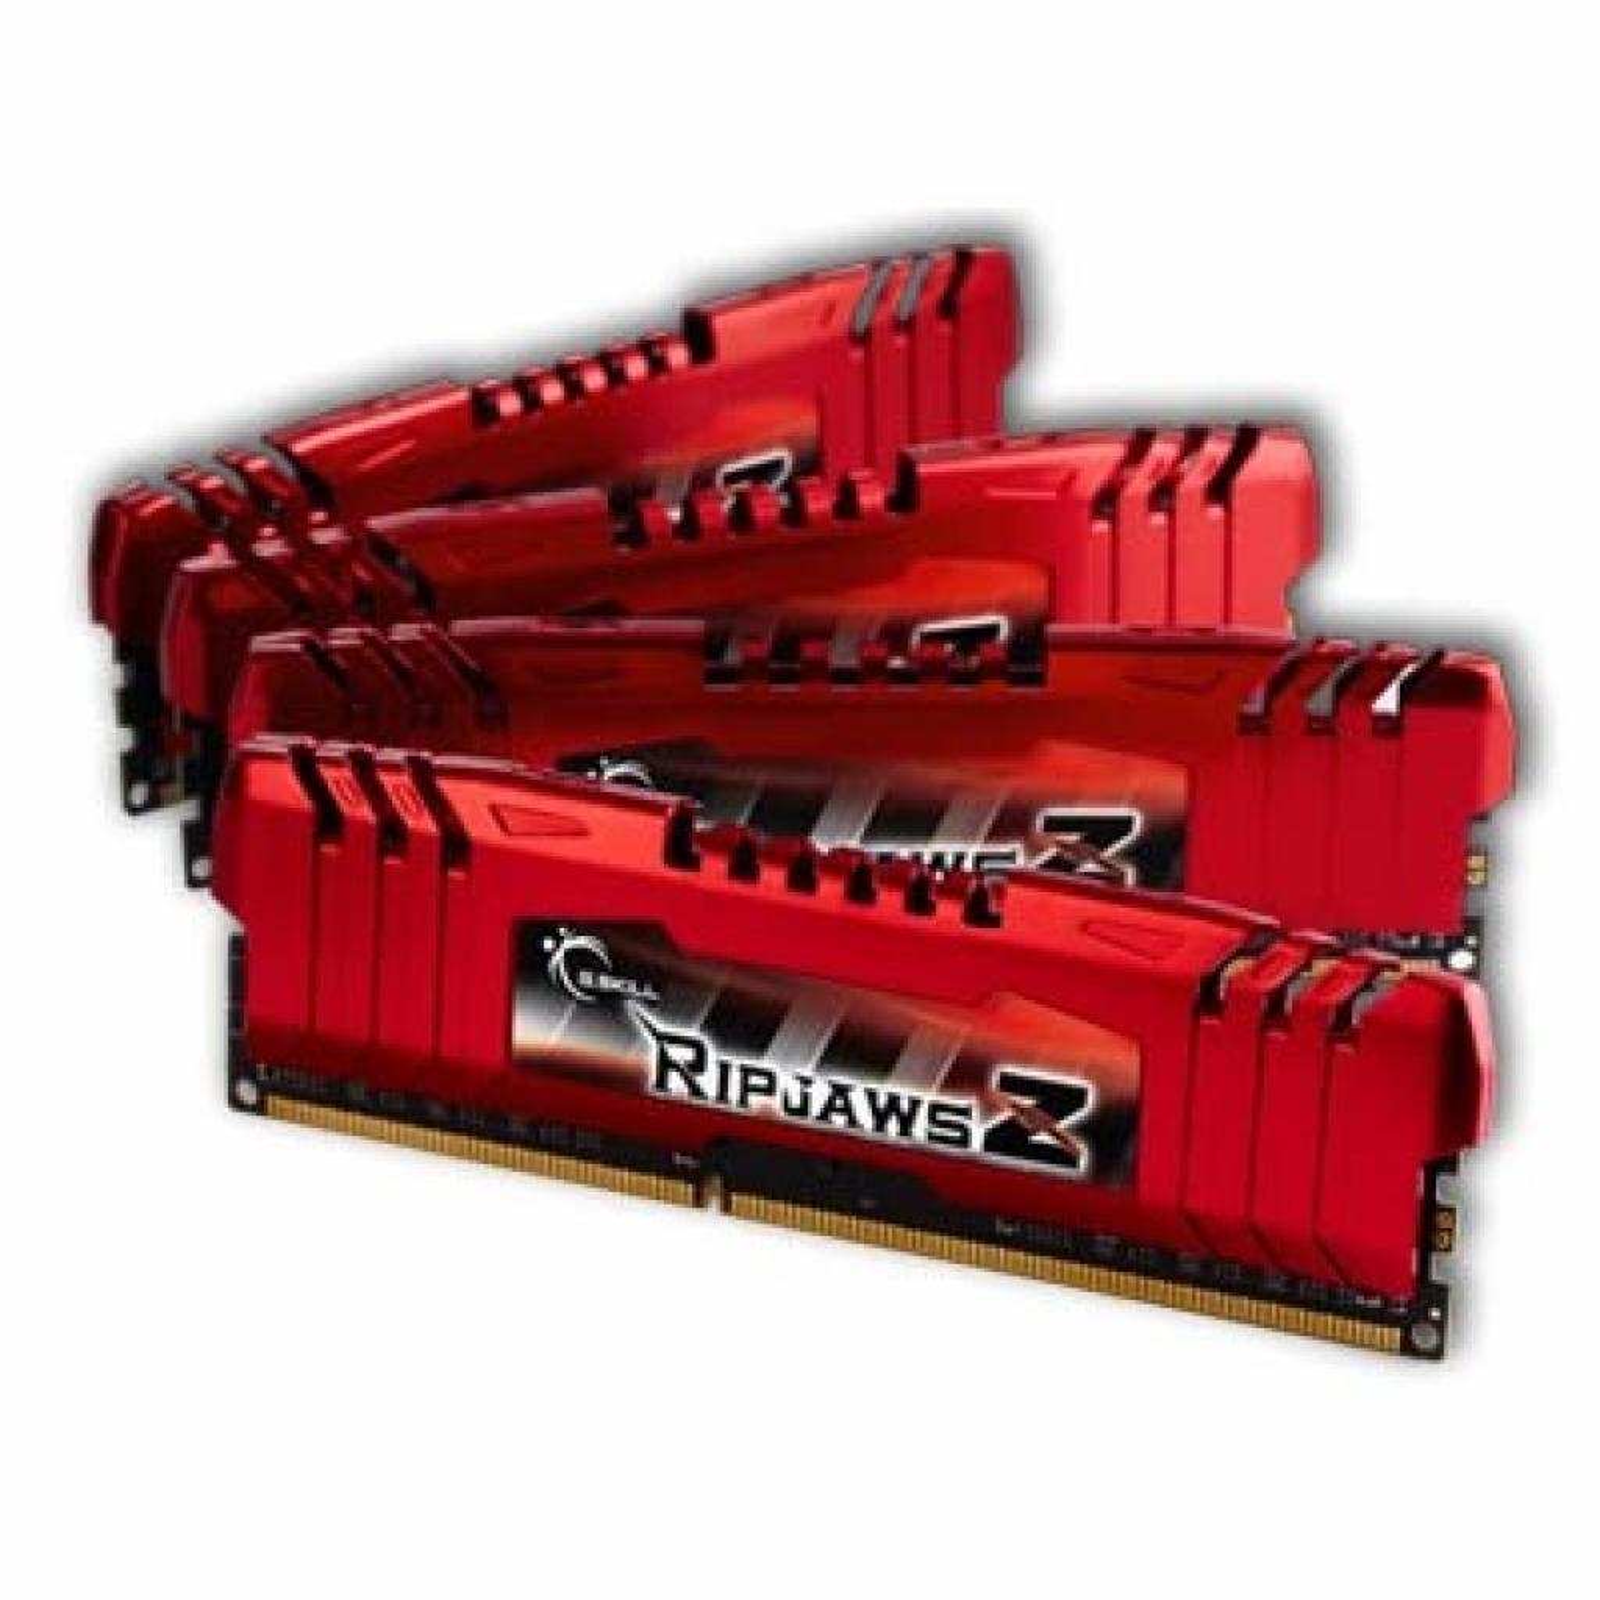 Модуль памяти для компьютера DDR3 16GB (4x4GB) 2133 MHz G.Skill (F3-17000CL11Q-16GBZL)